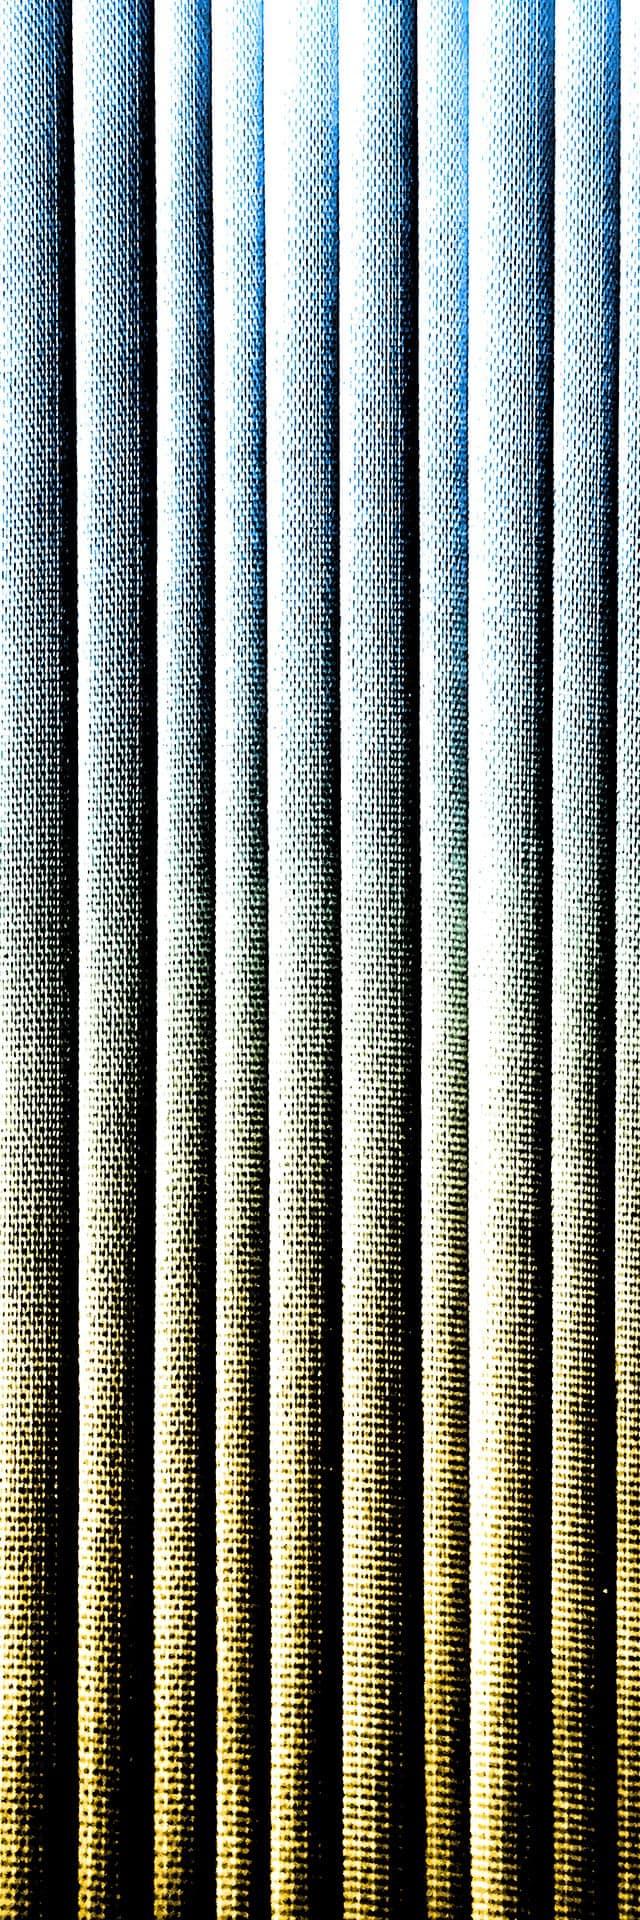 artnorama - Linen Lines